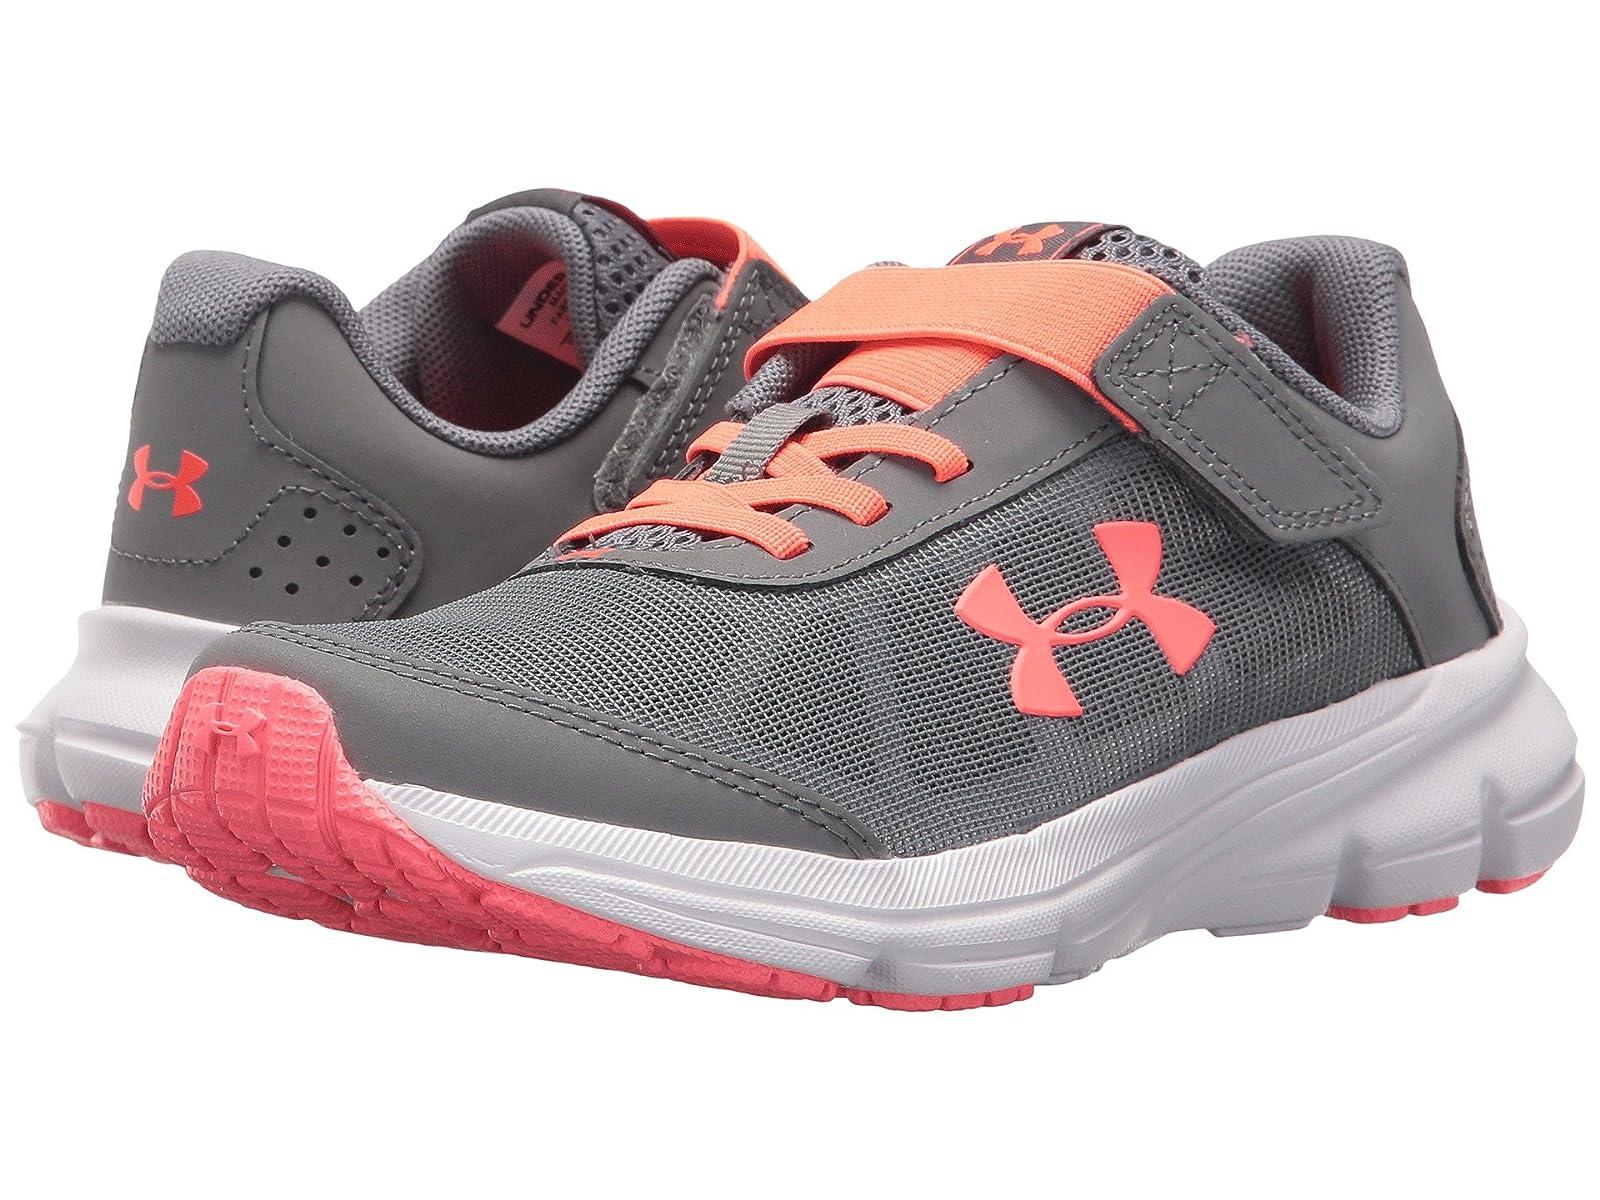 Under Armour Kids UA GPS Rave 2 AC (Little Kid)Atmospheric grades have affordable shoes